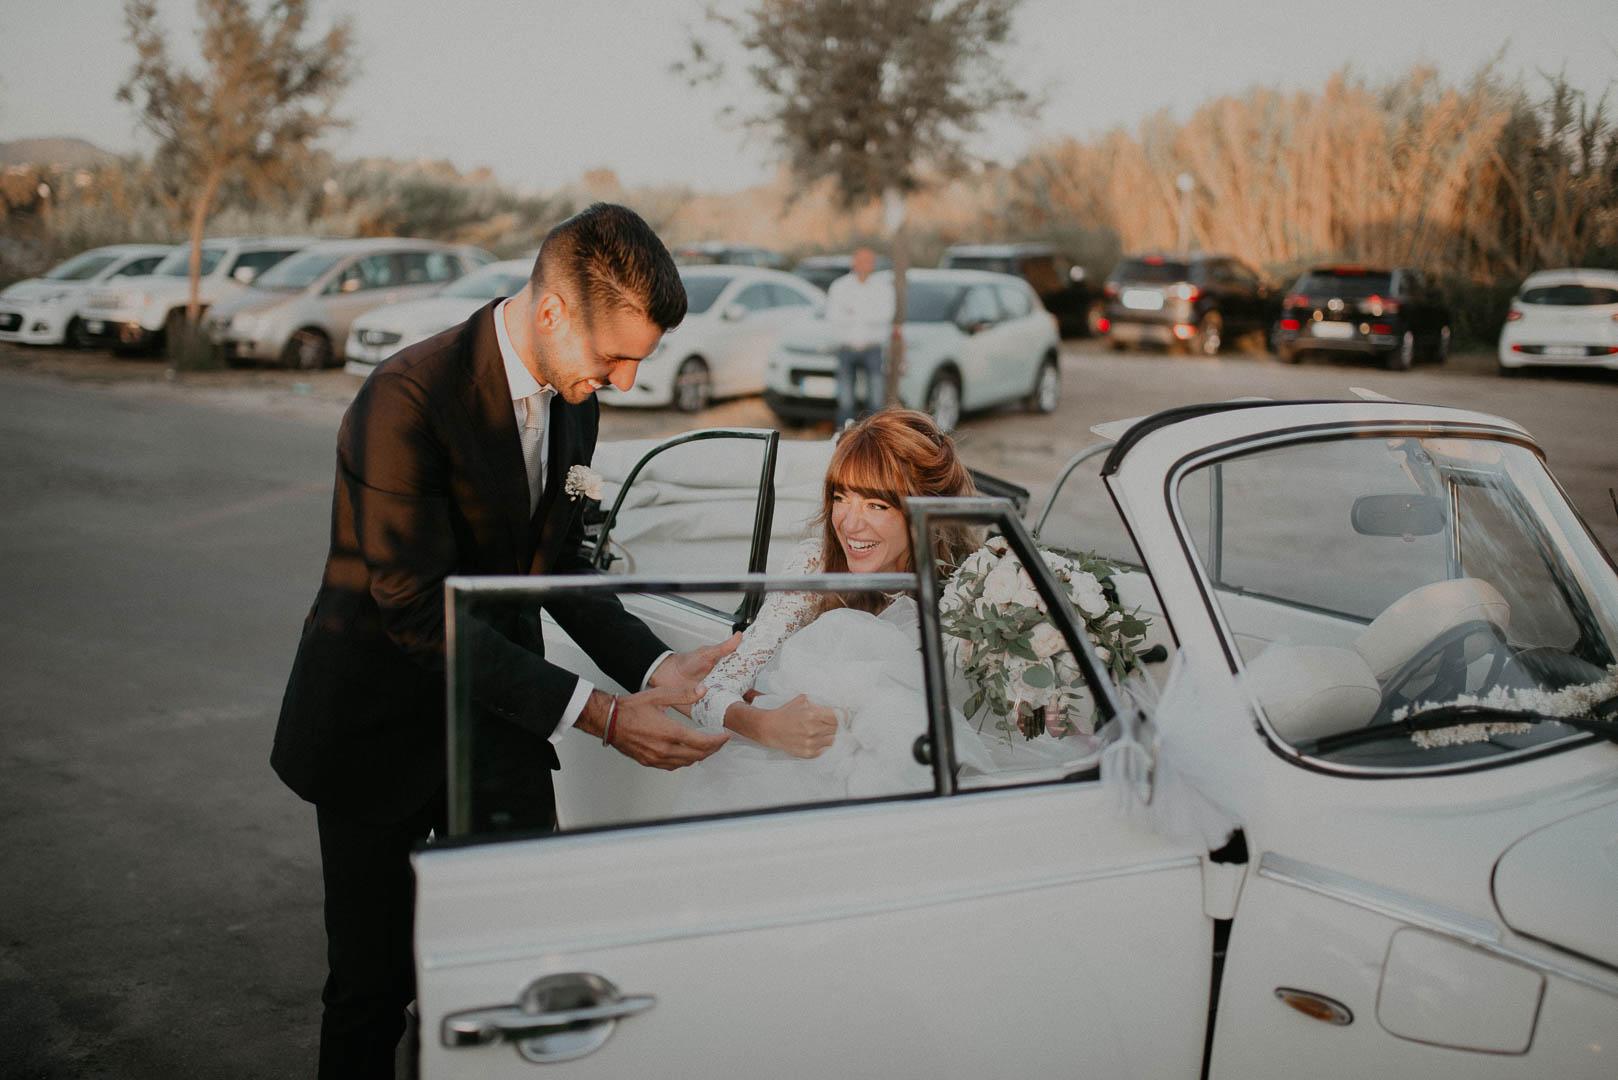 wedding-photographer-destination-fineart-bespoke-reportage-napoli-nabilah-vivianeizzo-spazio46-107